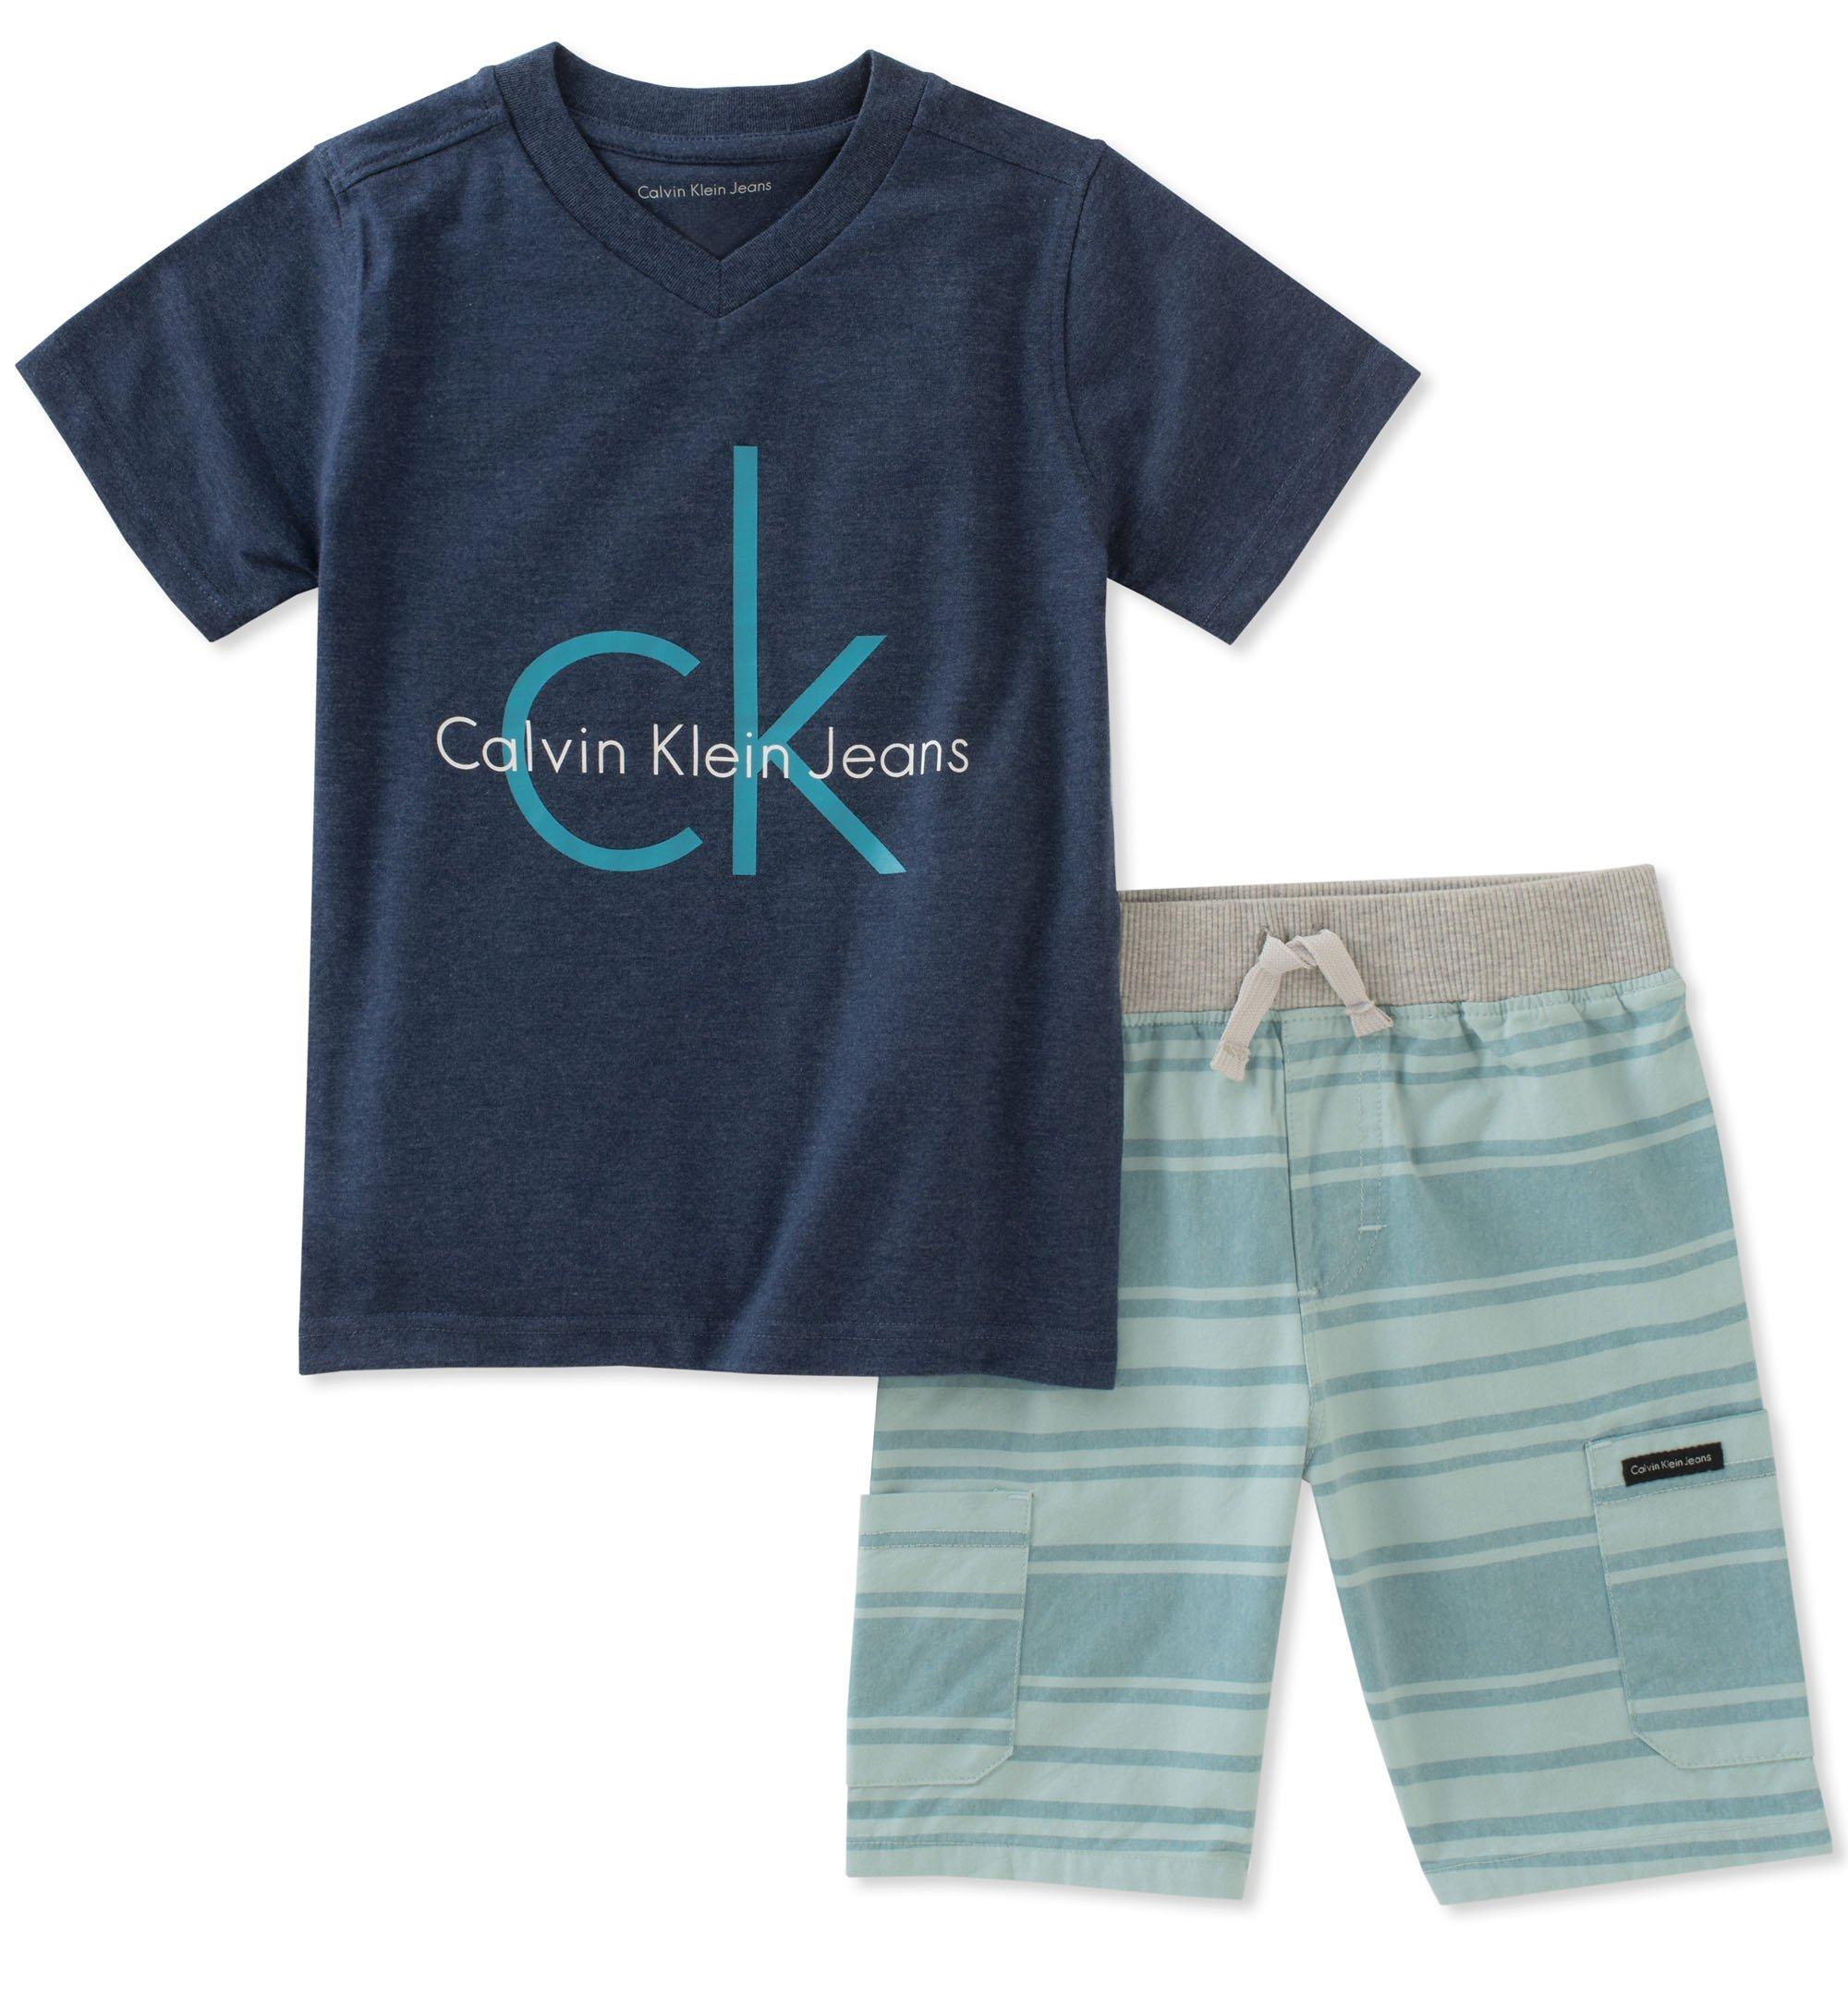 Calvin Klein Little Boys' 2 Pieces Shorts Set, Blue, 5